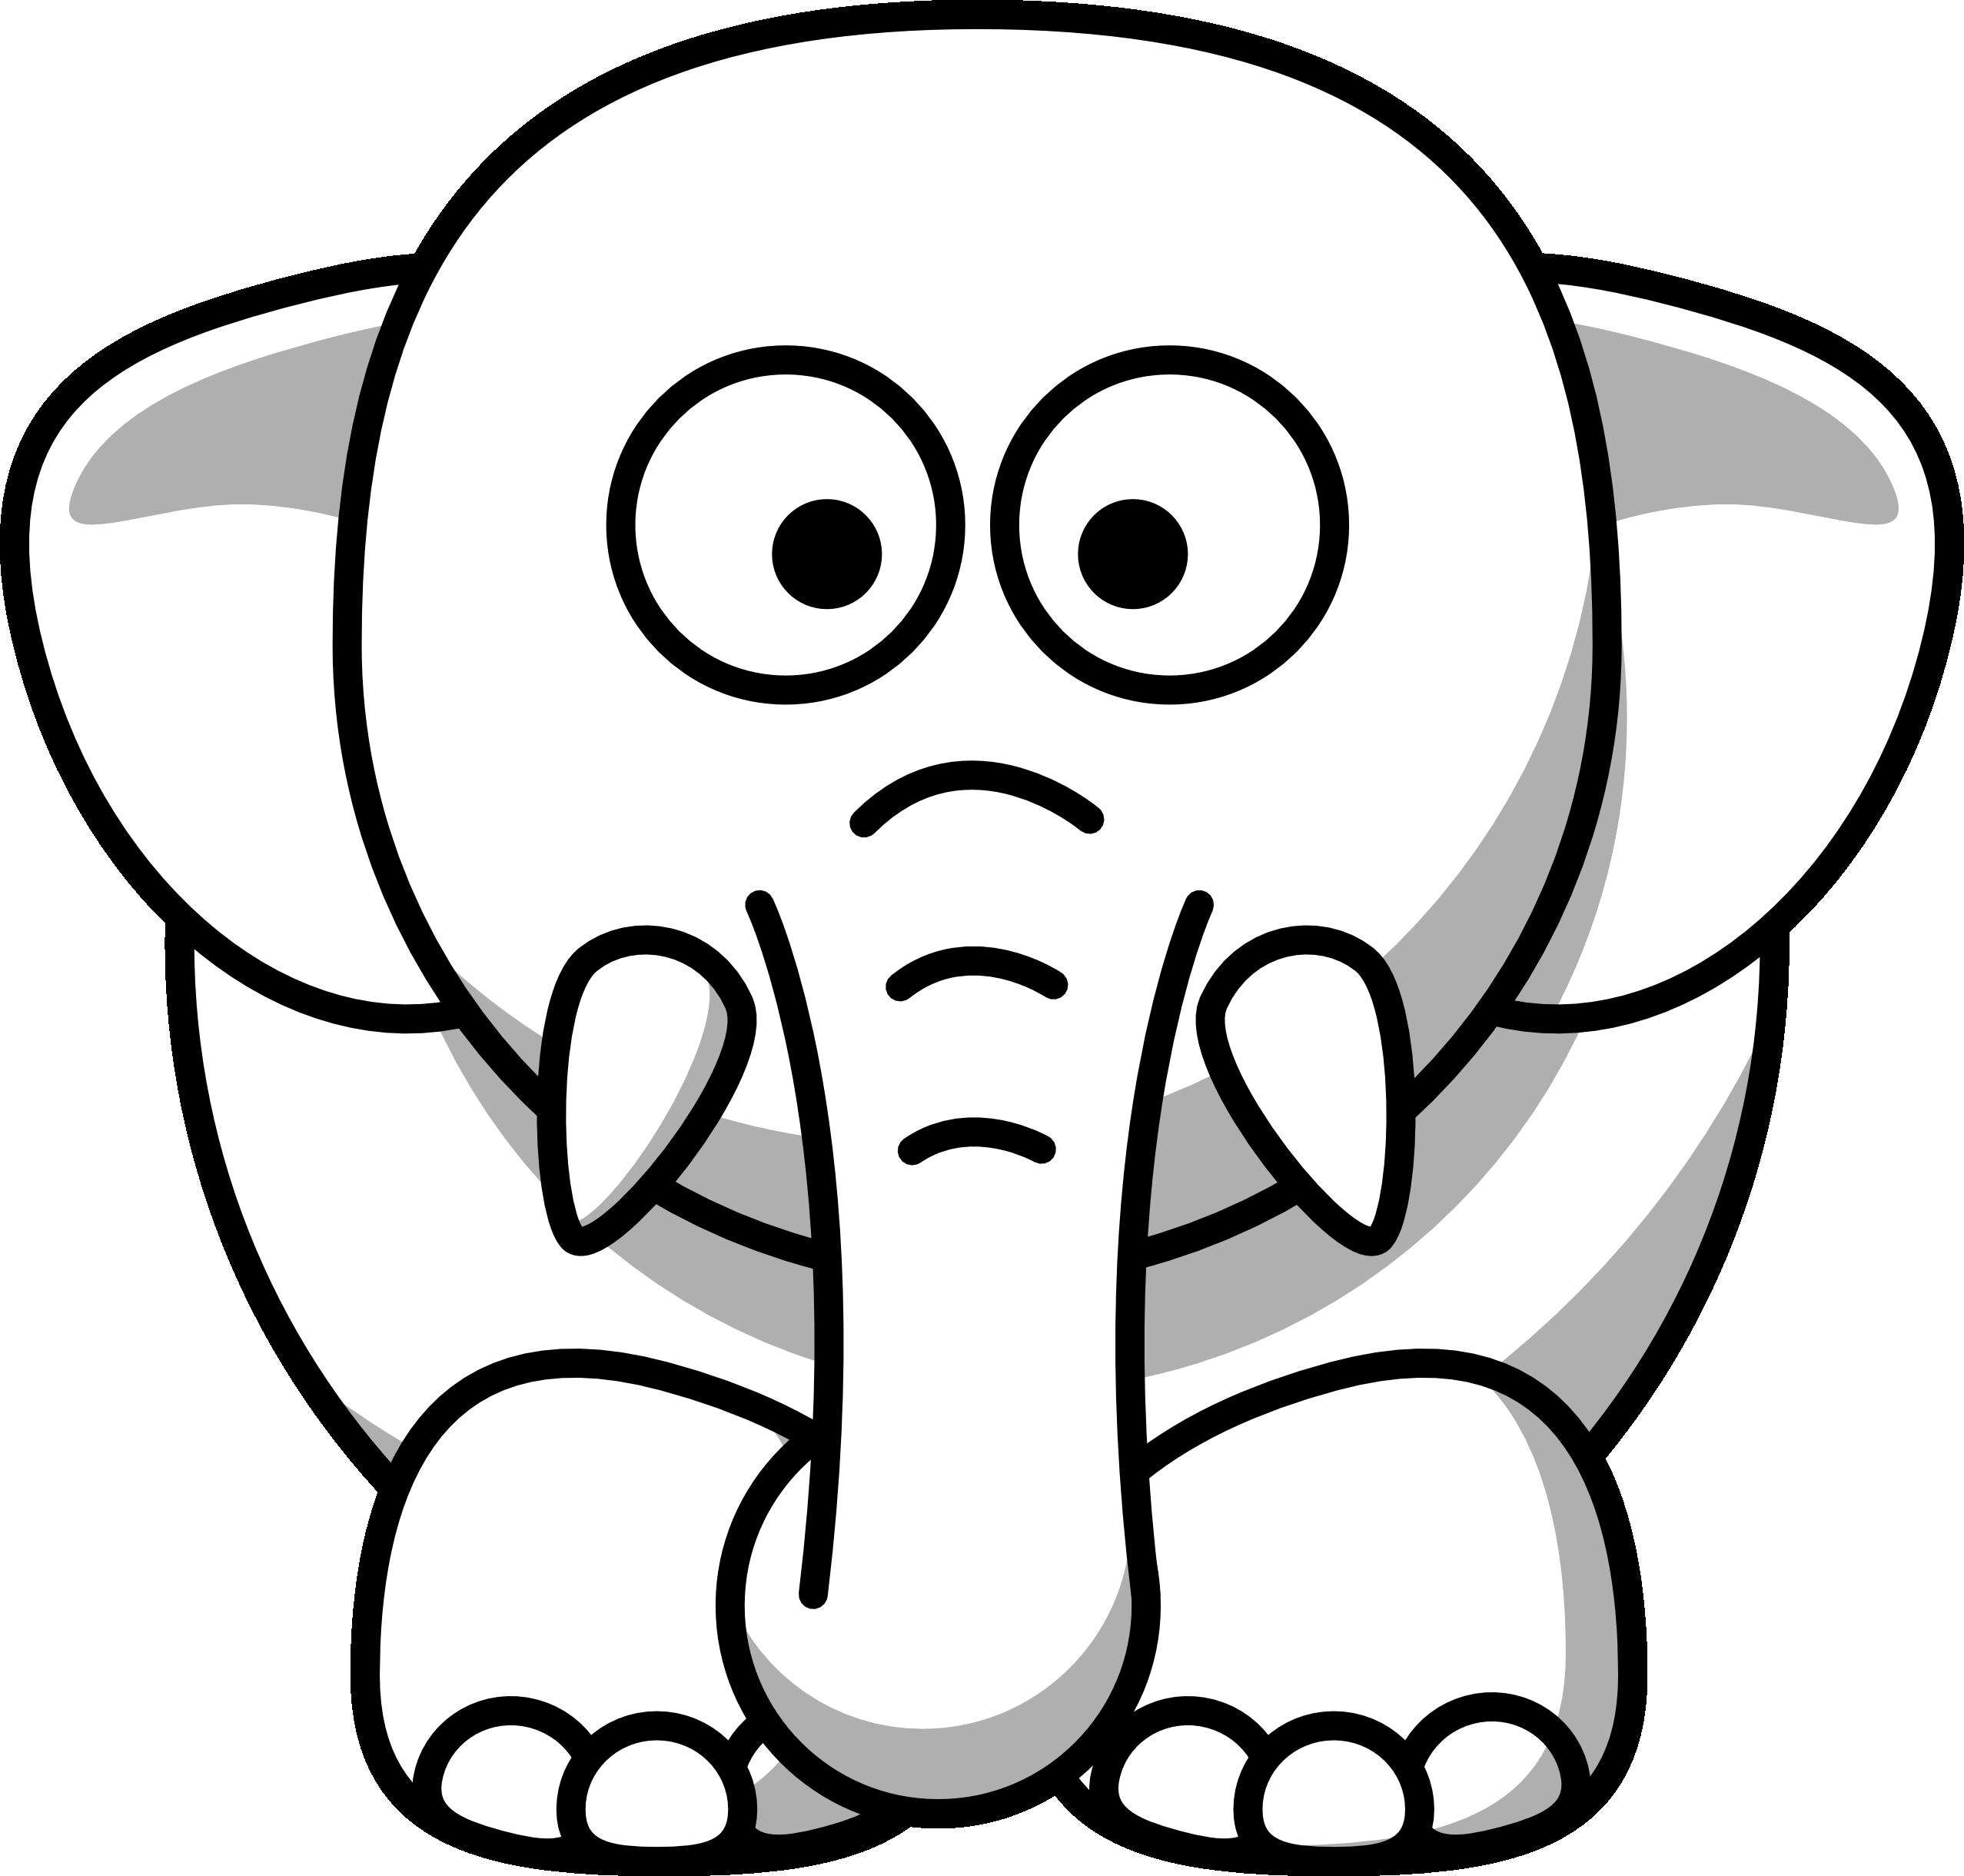 Net Clipart Black And White Elephant Cop-Net Clipart Black And White Elephant Copy Black White Line Art-2